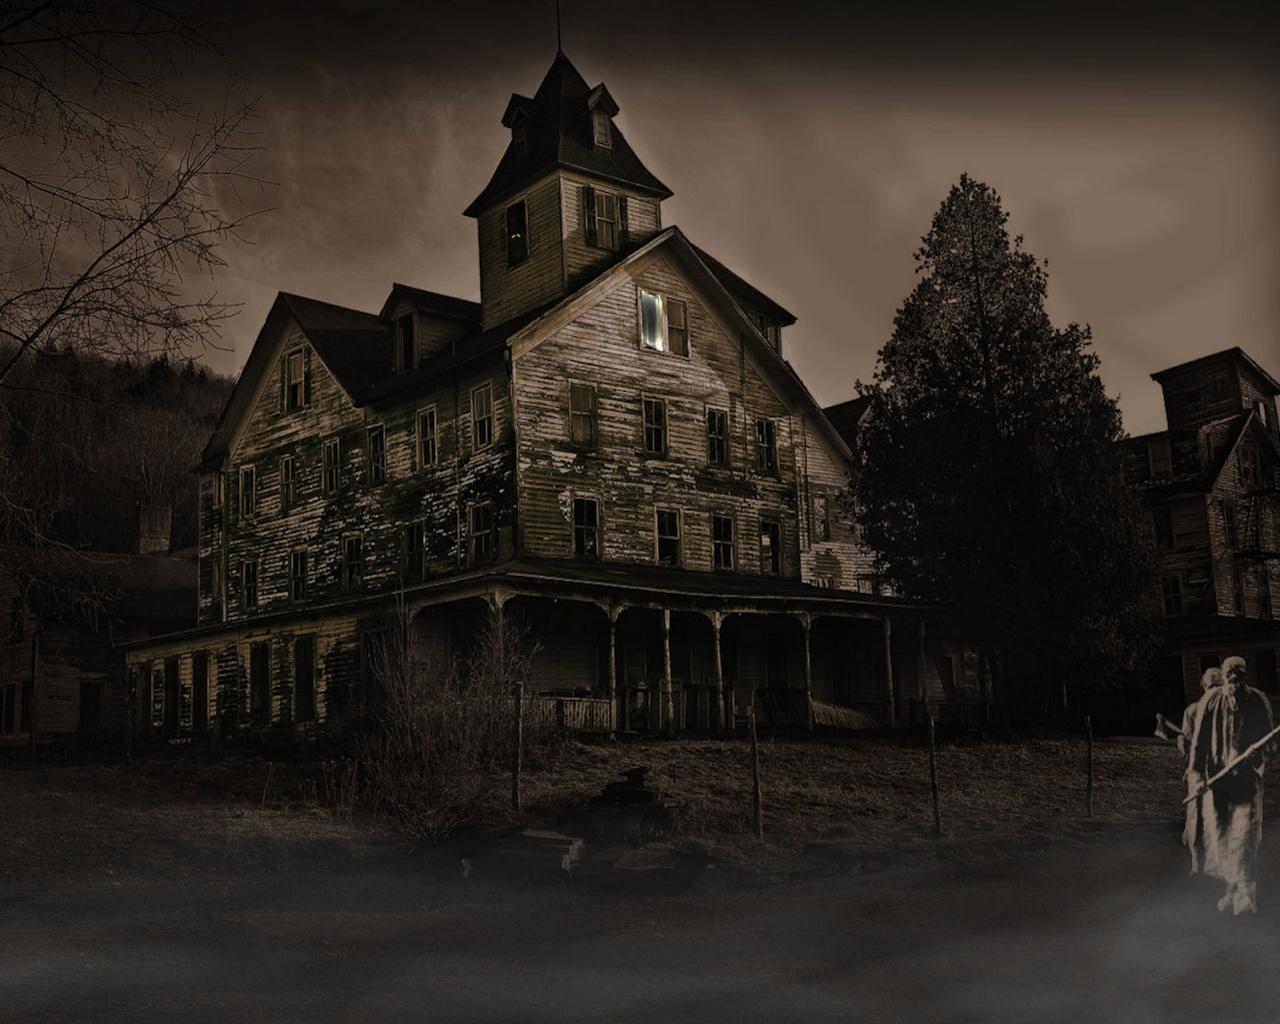 Haunted House Wallpaper   1280x1024 1280x1024